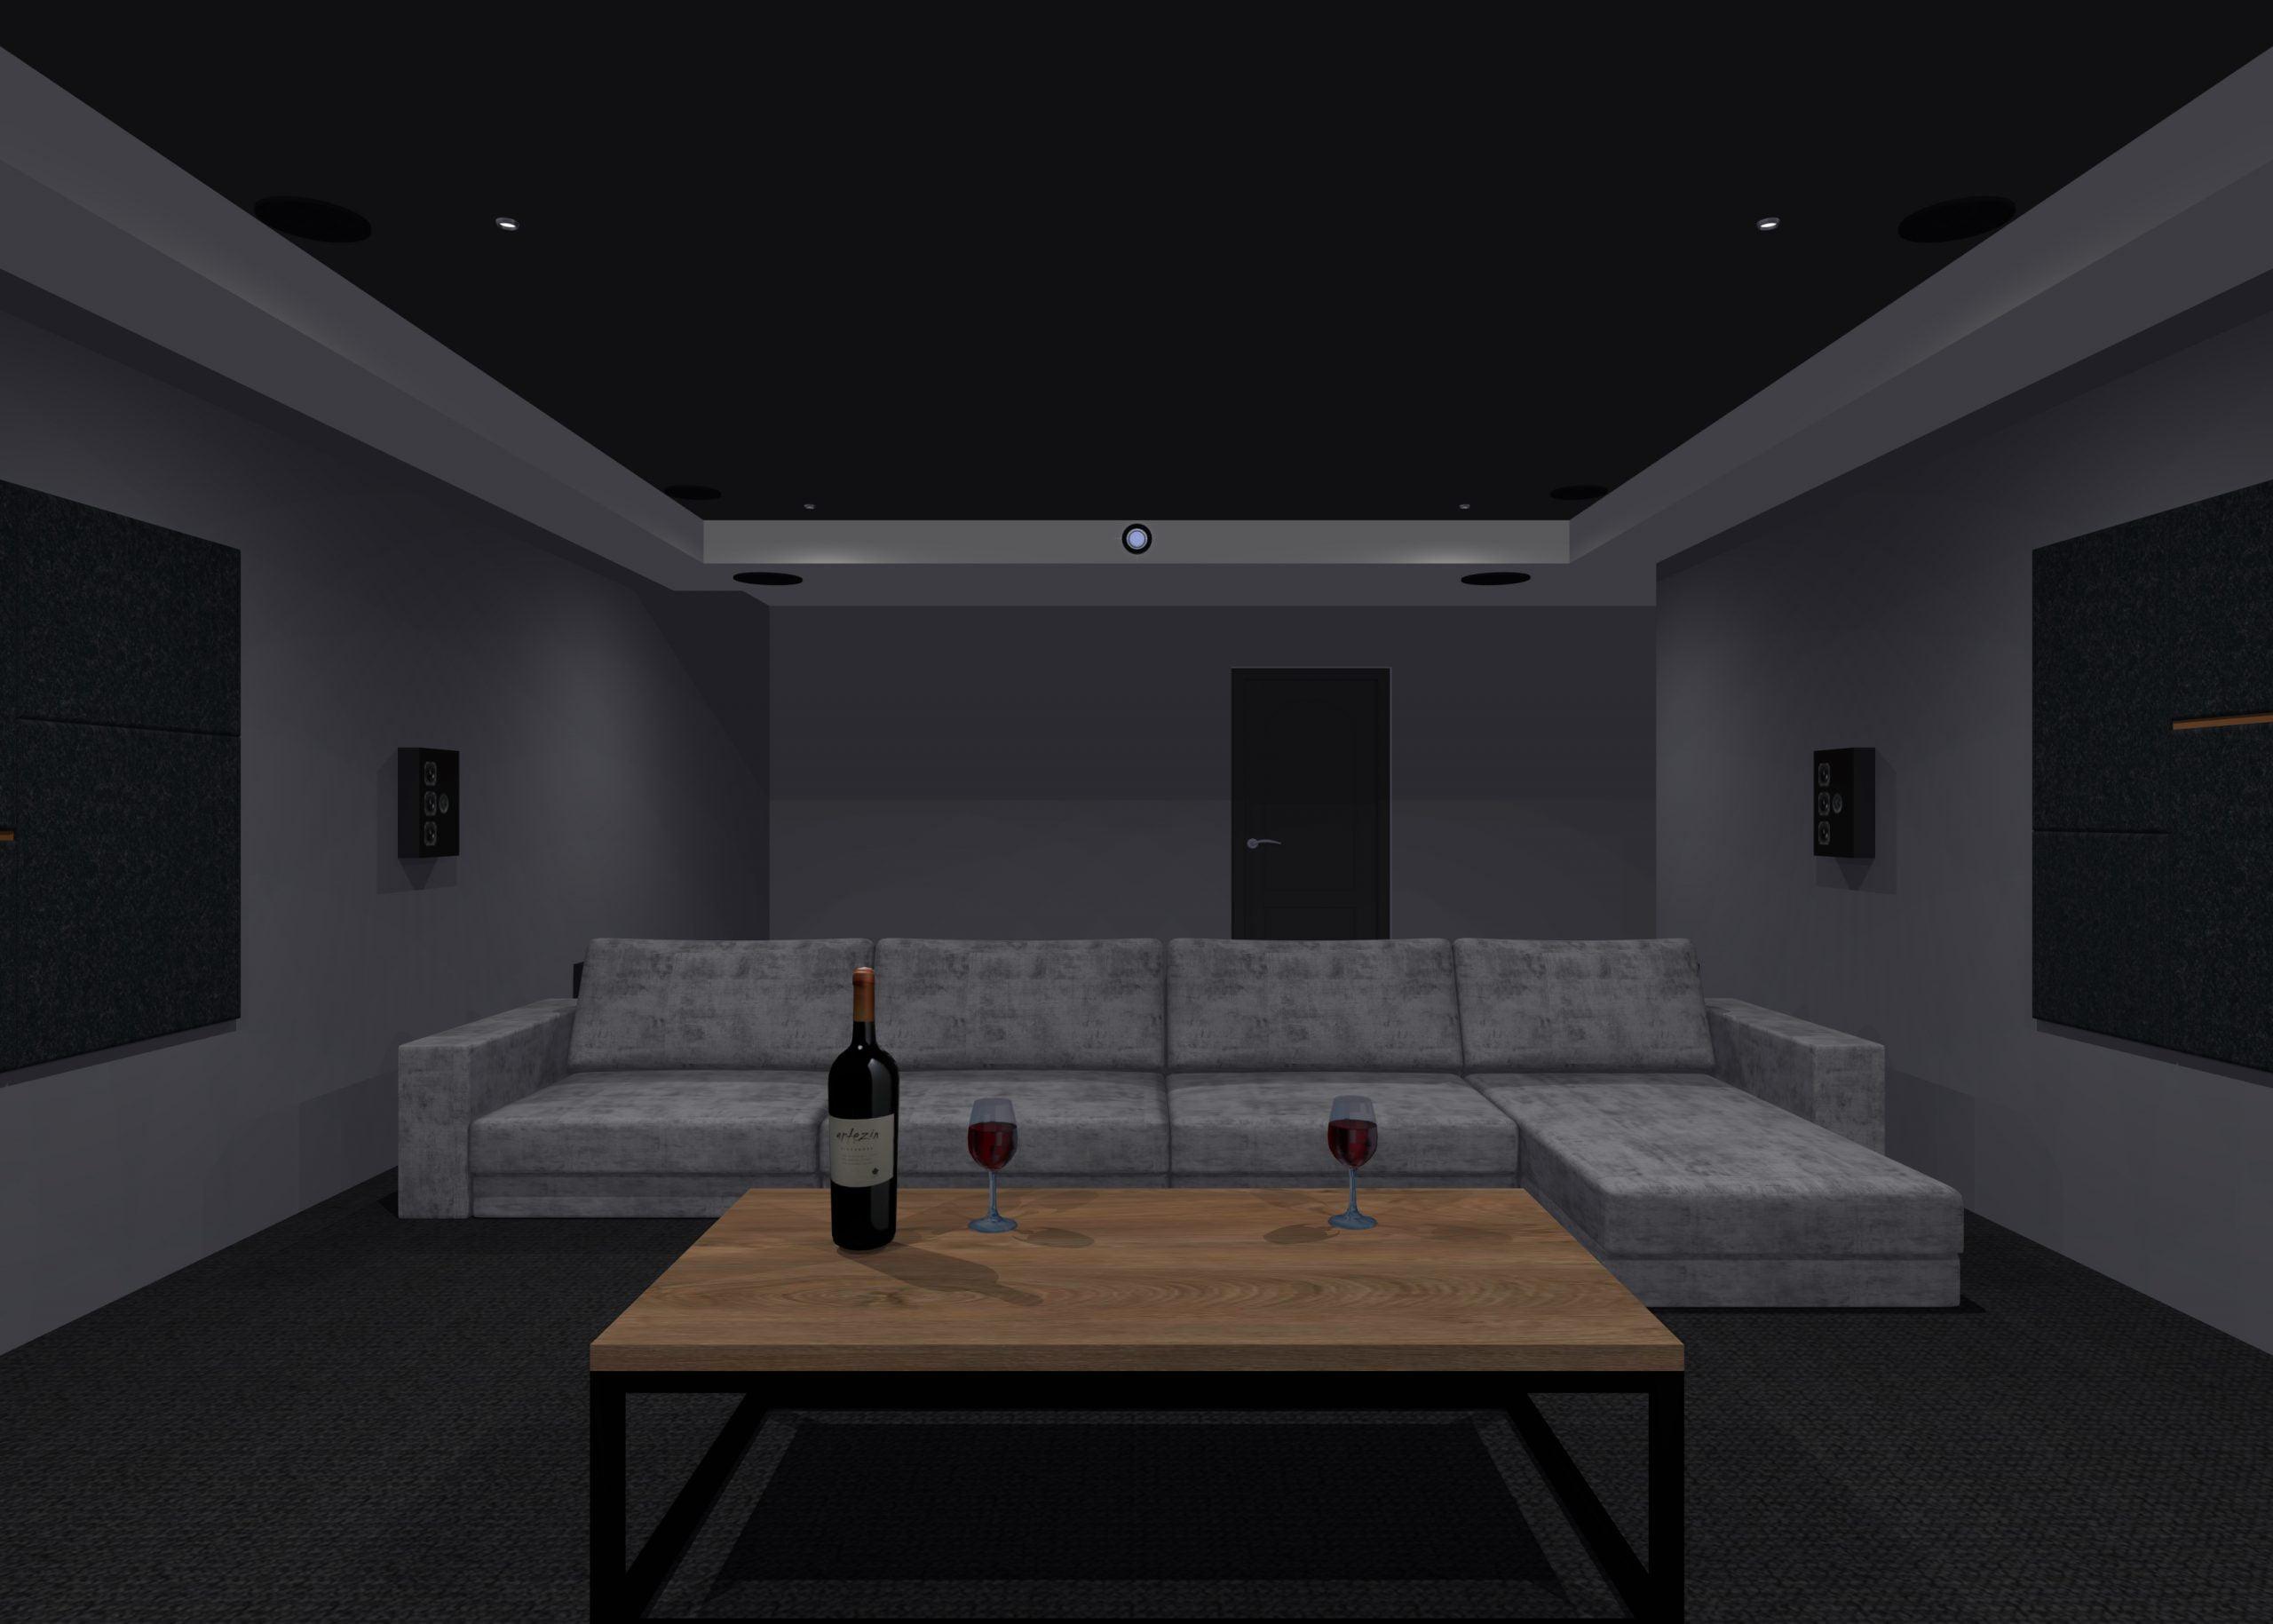 Garage conversion home cinema seating layout